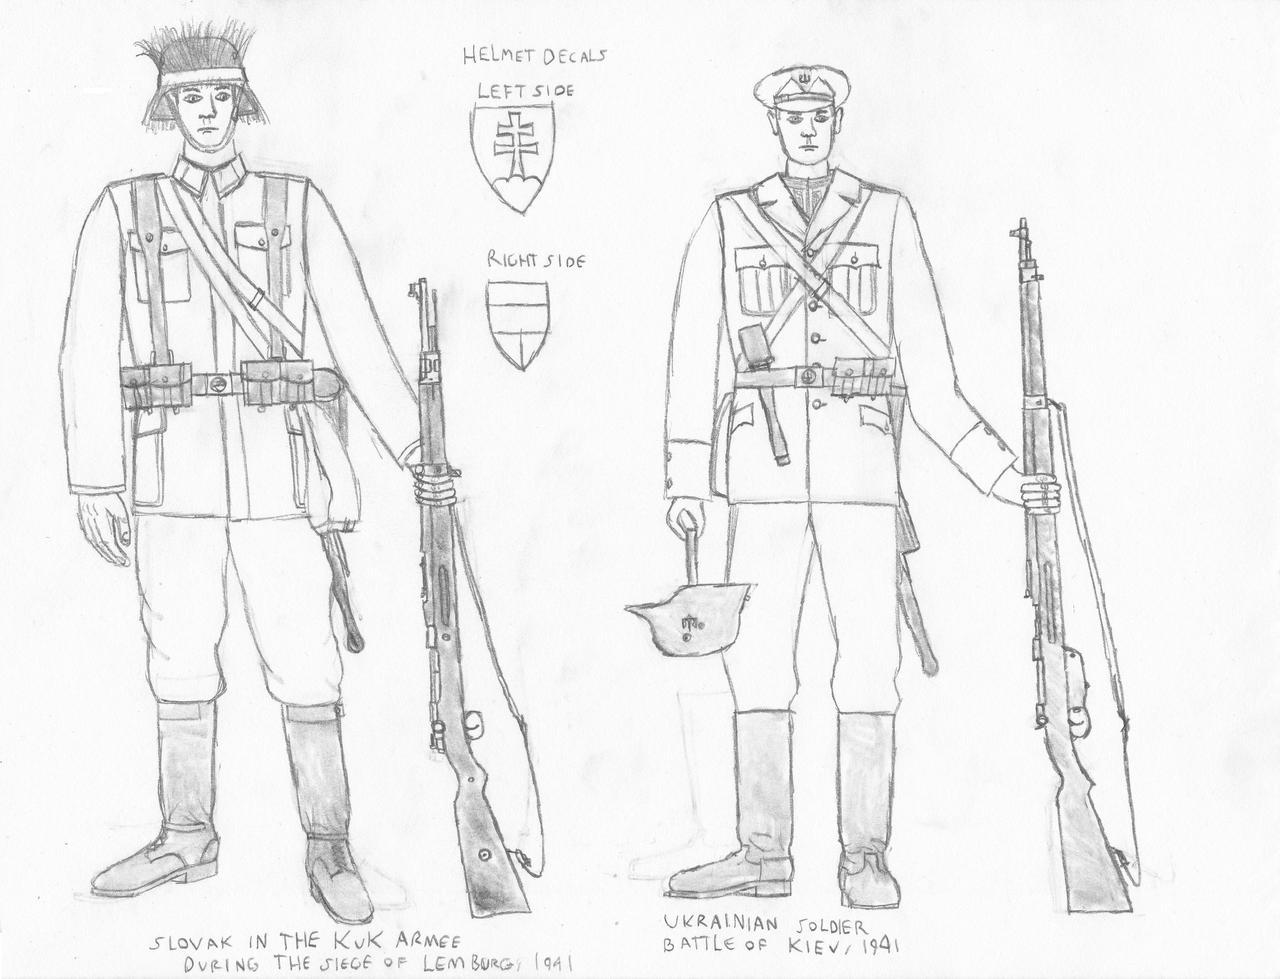 early_second_great_war_kuk_and_ukrainian_soldiers_by_marlowski_de0basj-fullview.jpg